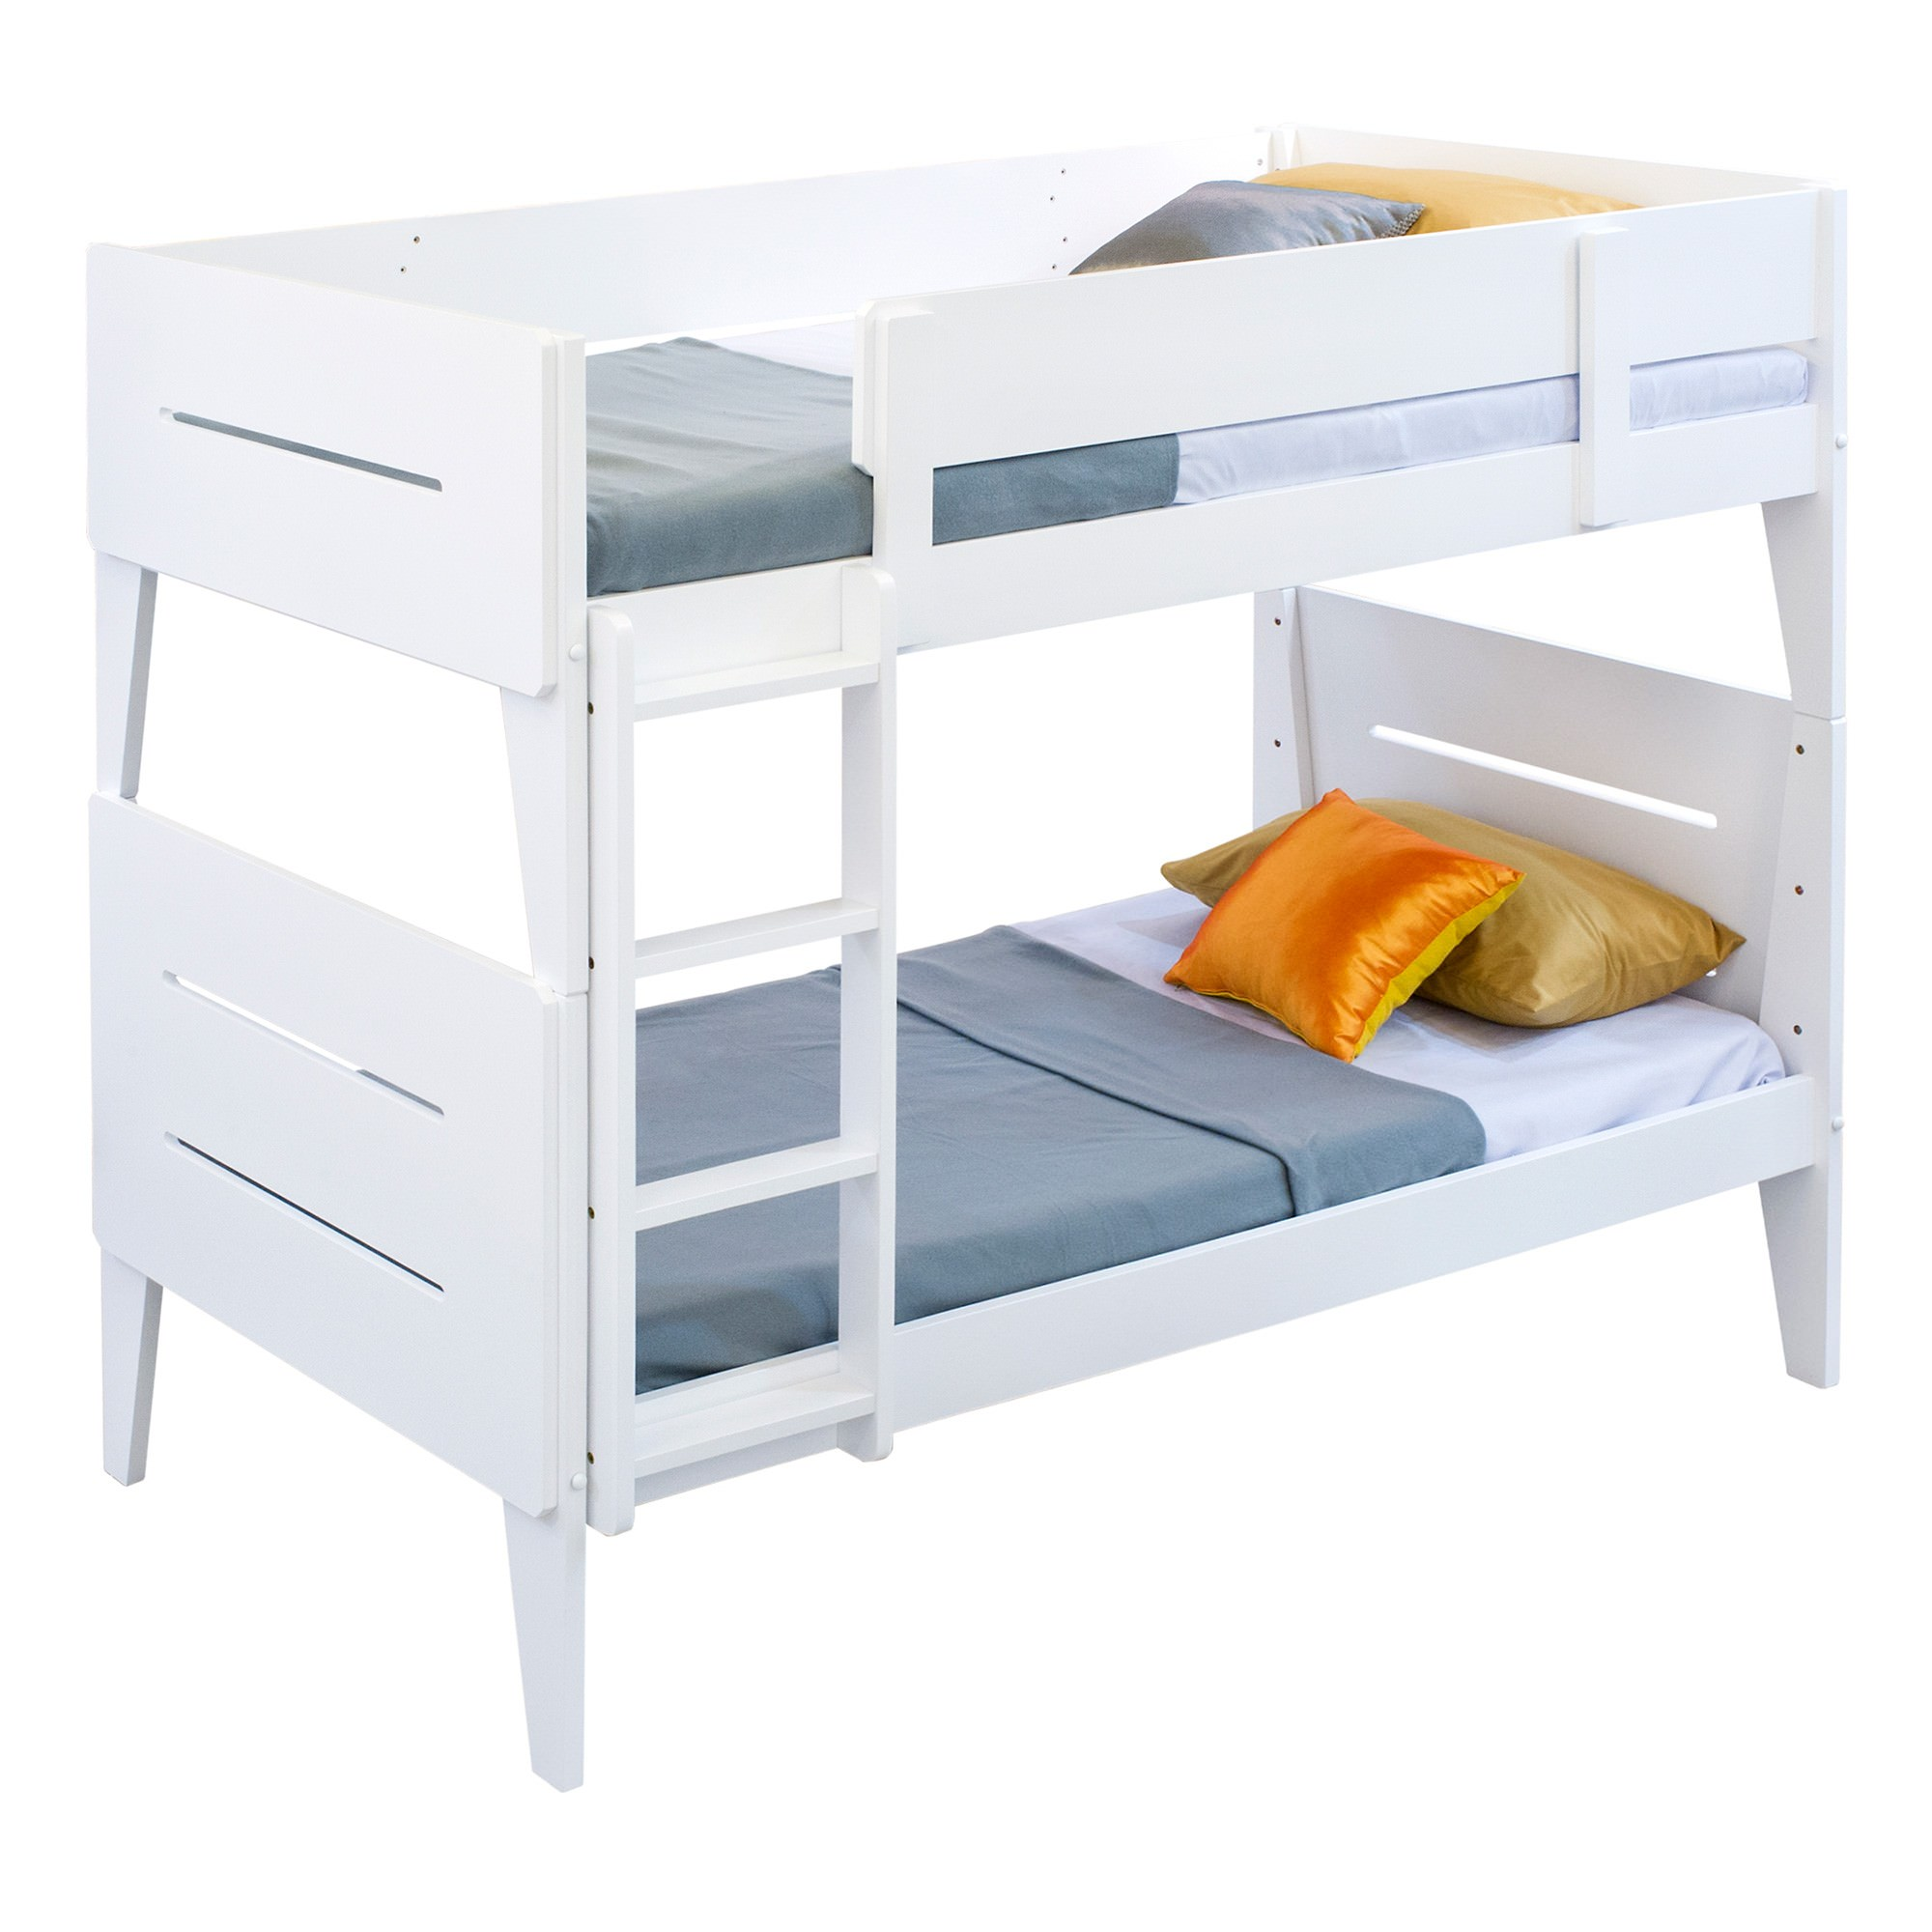 Antero Timber Bunk Bed, Single